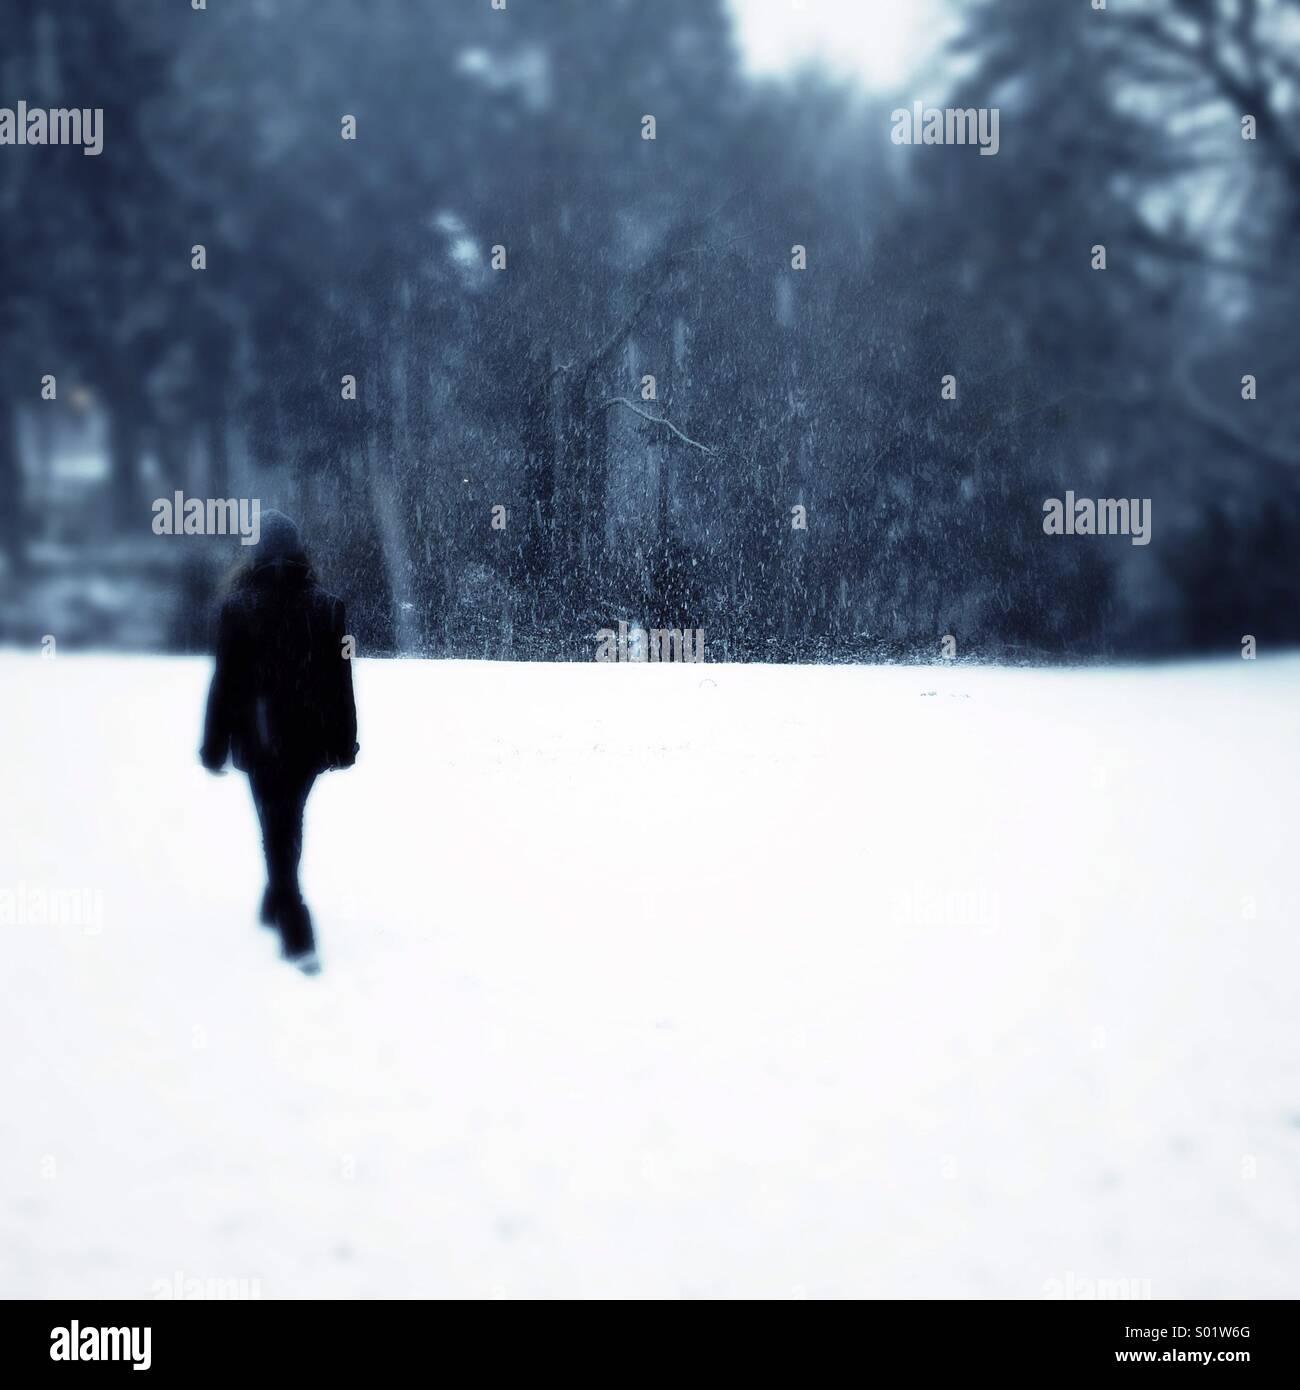 girl walking in snow - Stock Image